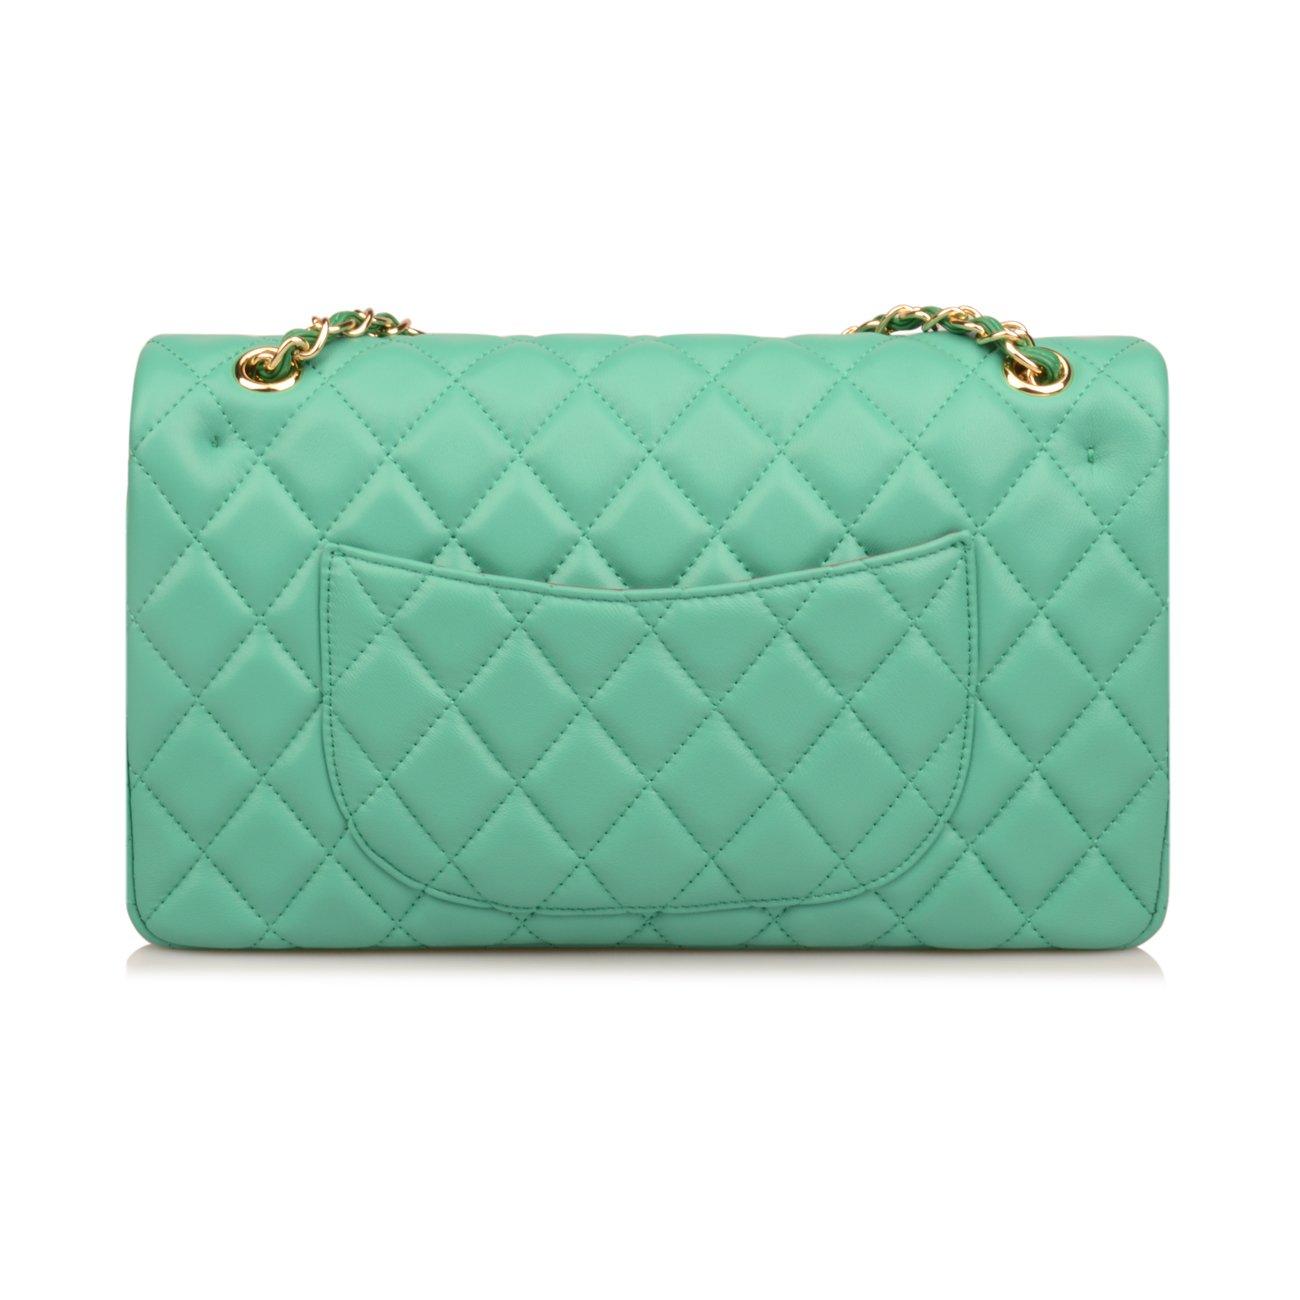 Ainifeel Women s Genuine Leather Quilted Chain Bag Shoulder Handbags Purse   Handbags  Amazon.com 3d3587c744081